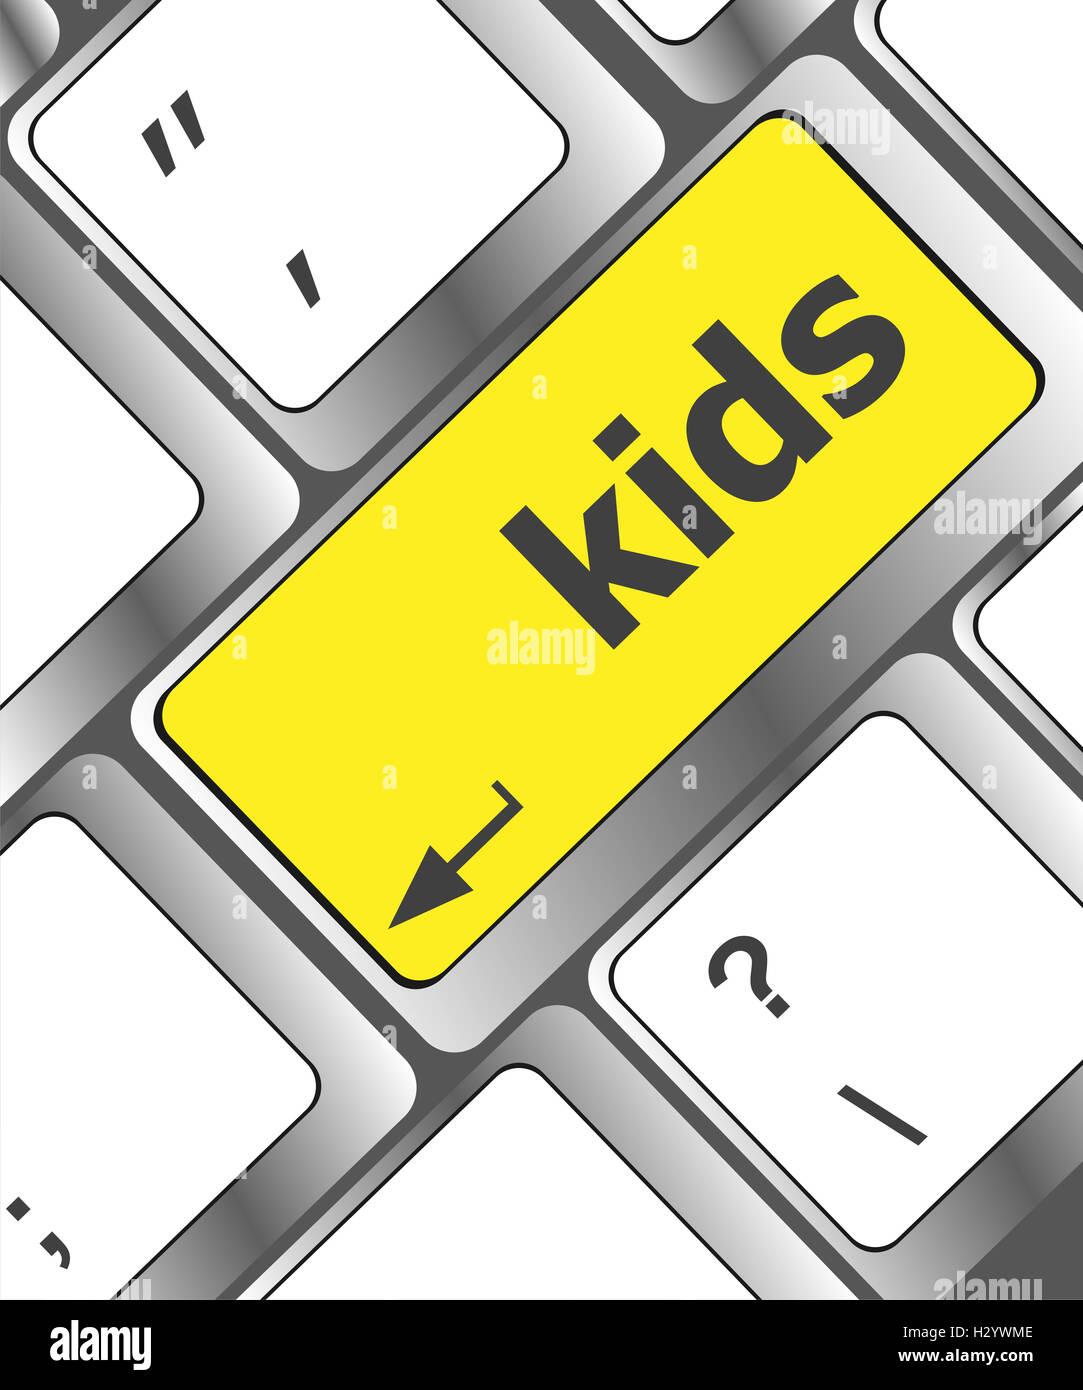 Child Computer Game Design Stock Photos Child Computer Game Design - Computer game design for kids